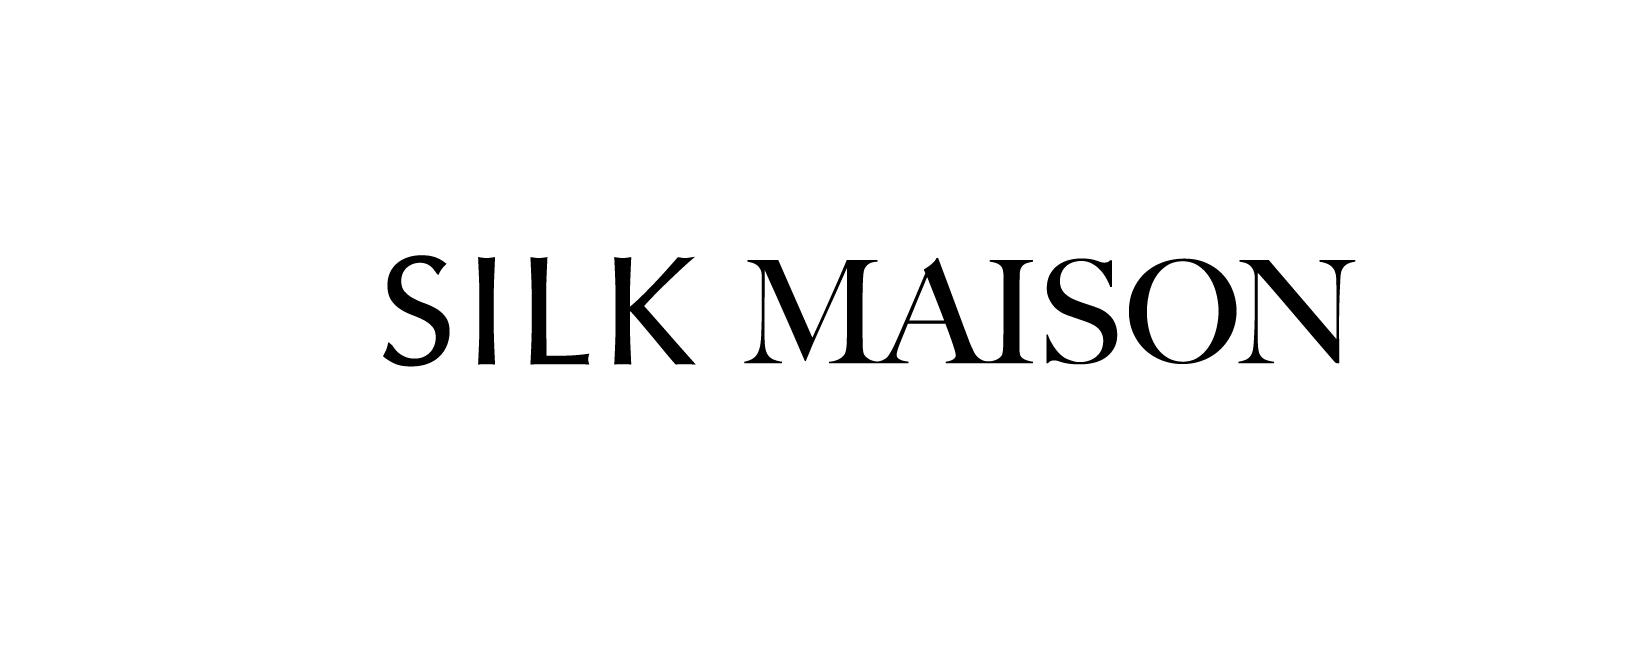 Silk Maison Discount Code 2021